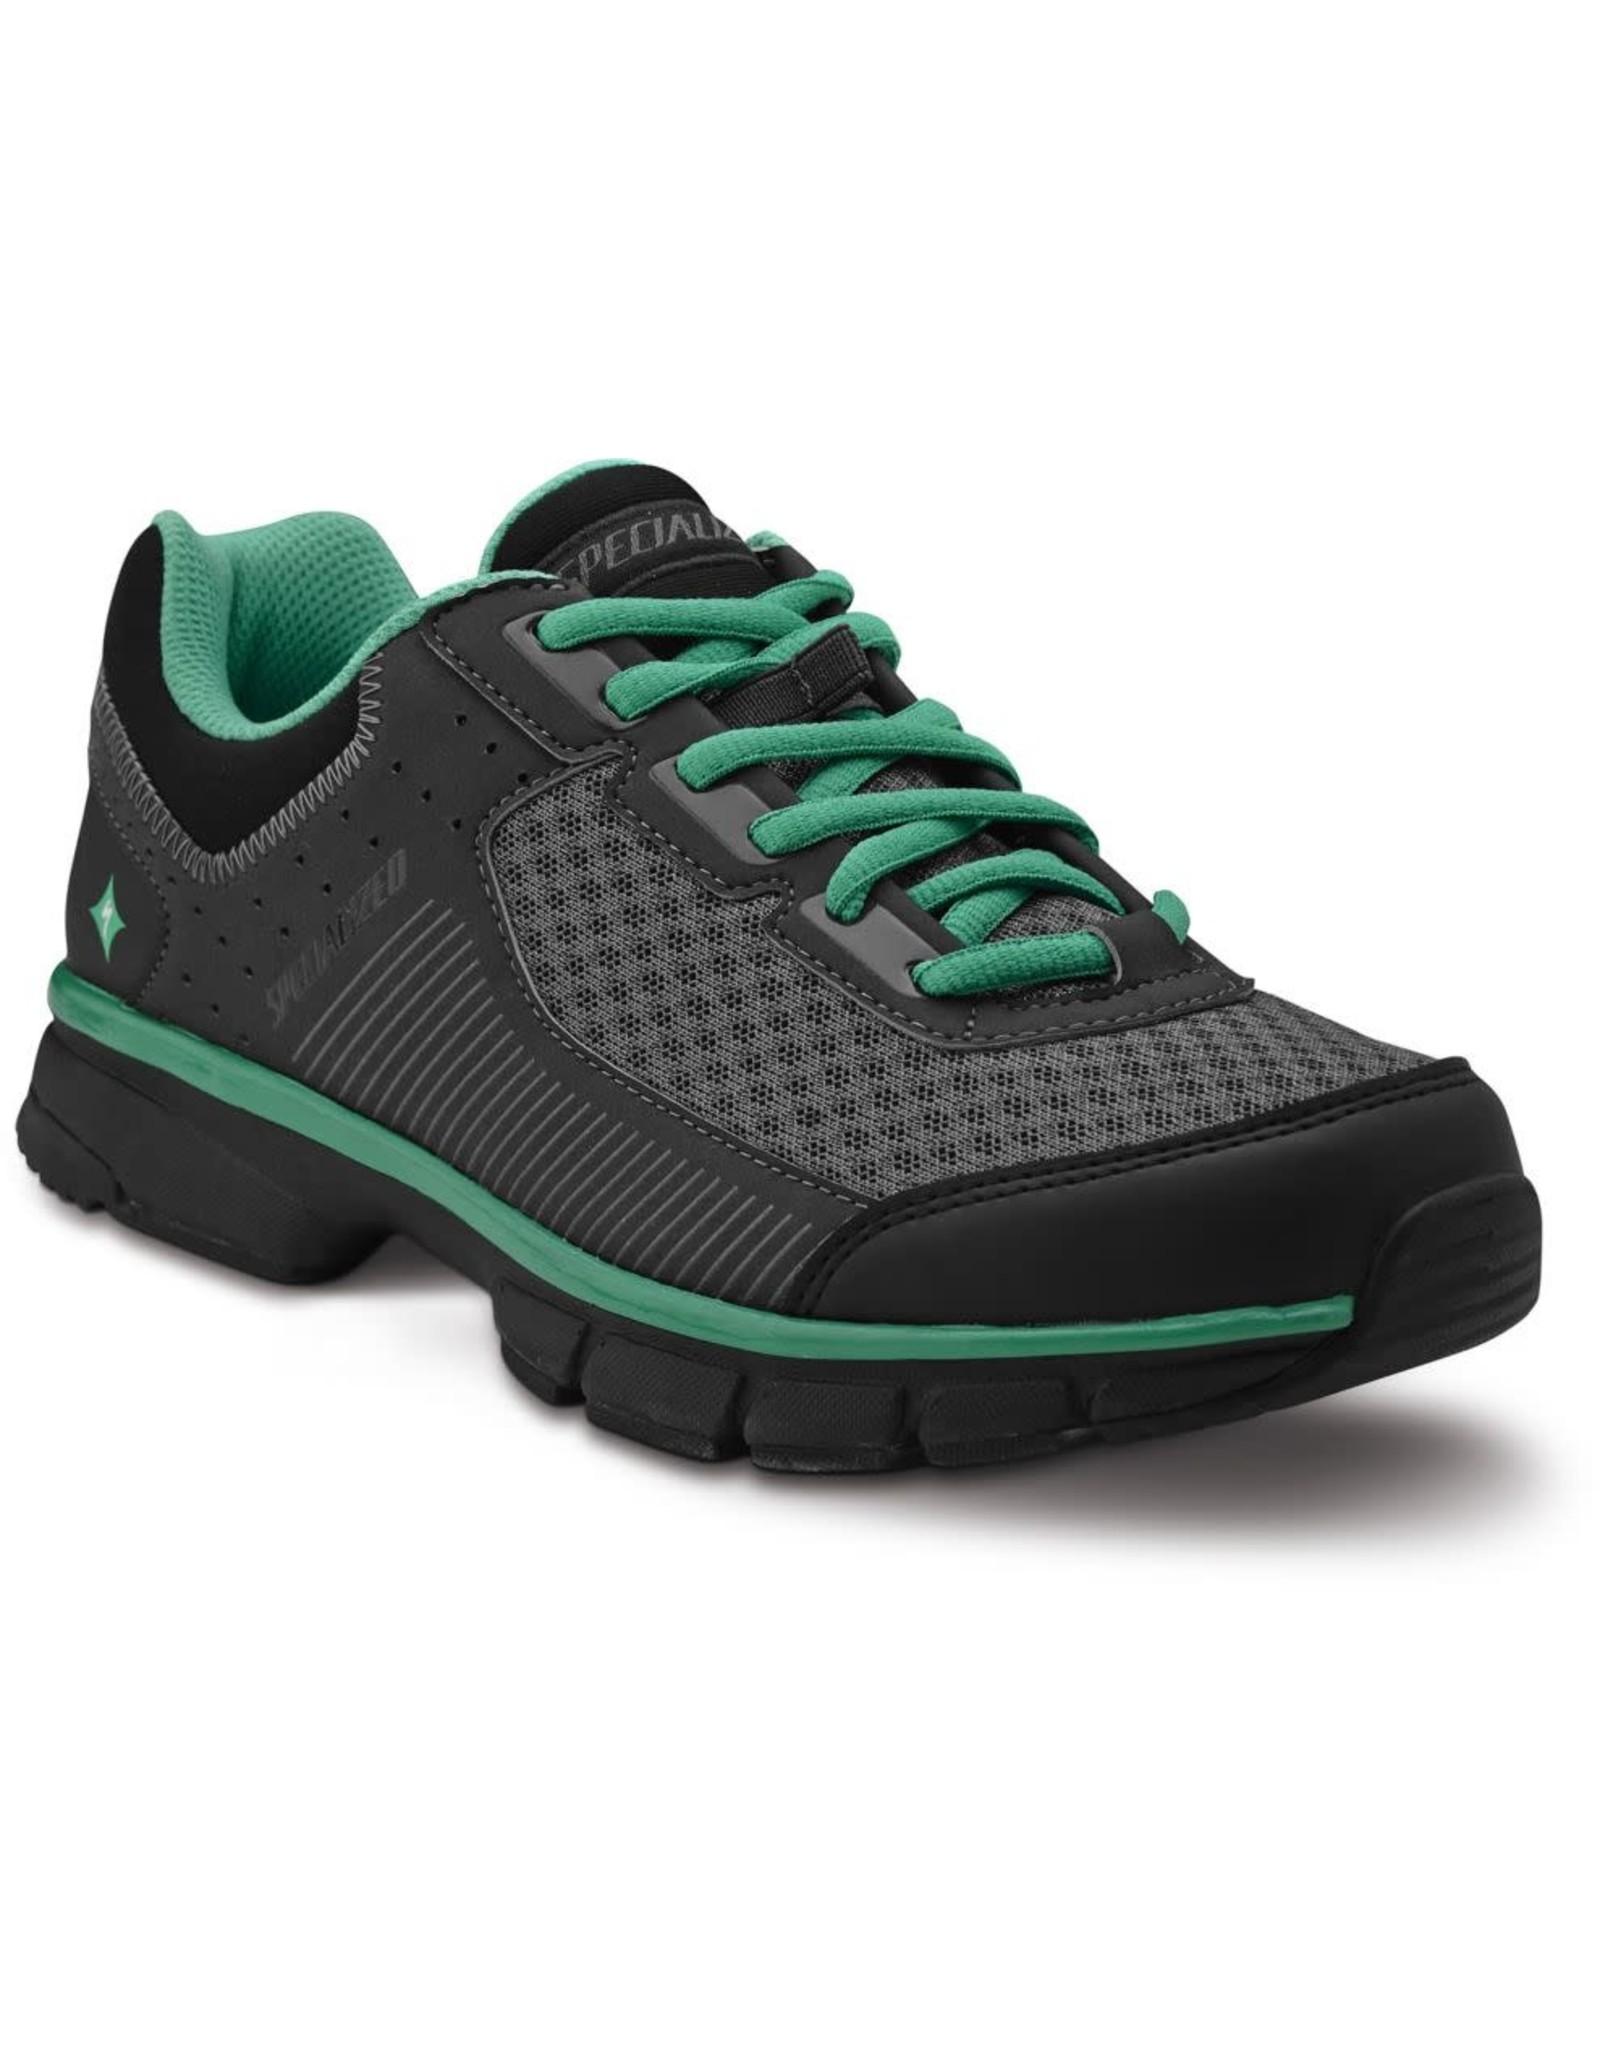 Specialized Shoe Spec Cadette Wmn Blk/Carb/Em Grn 41